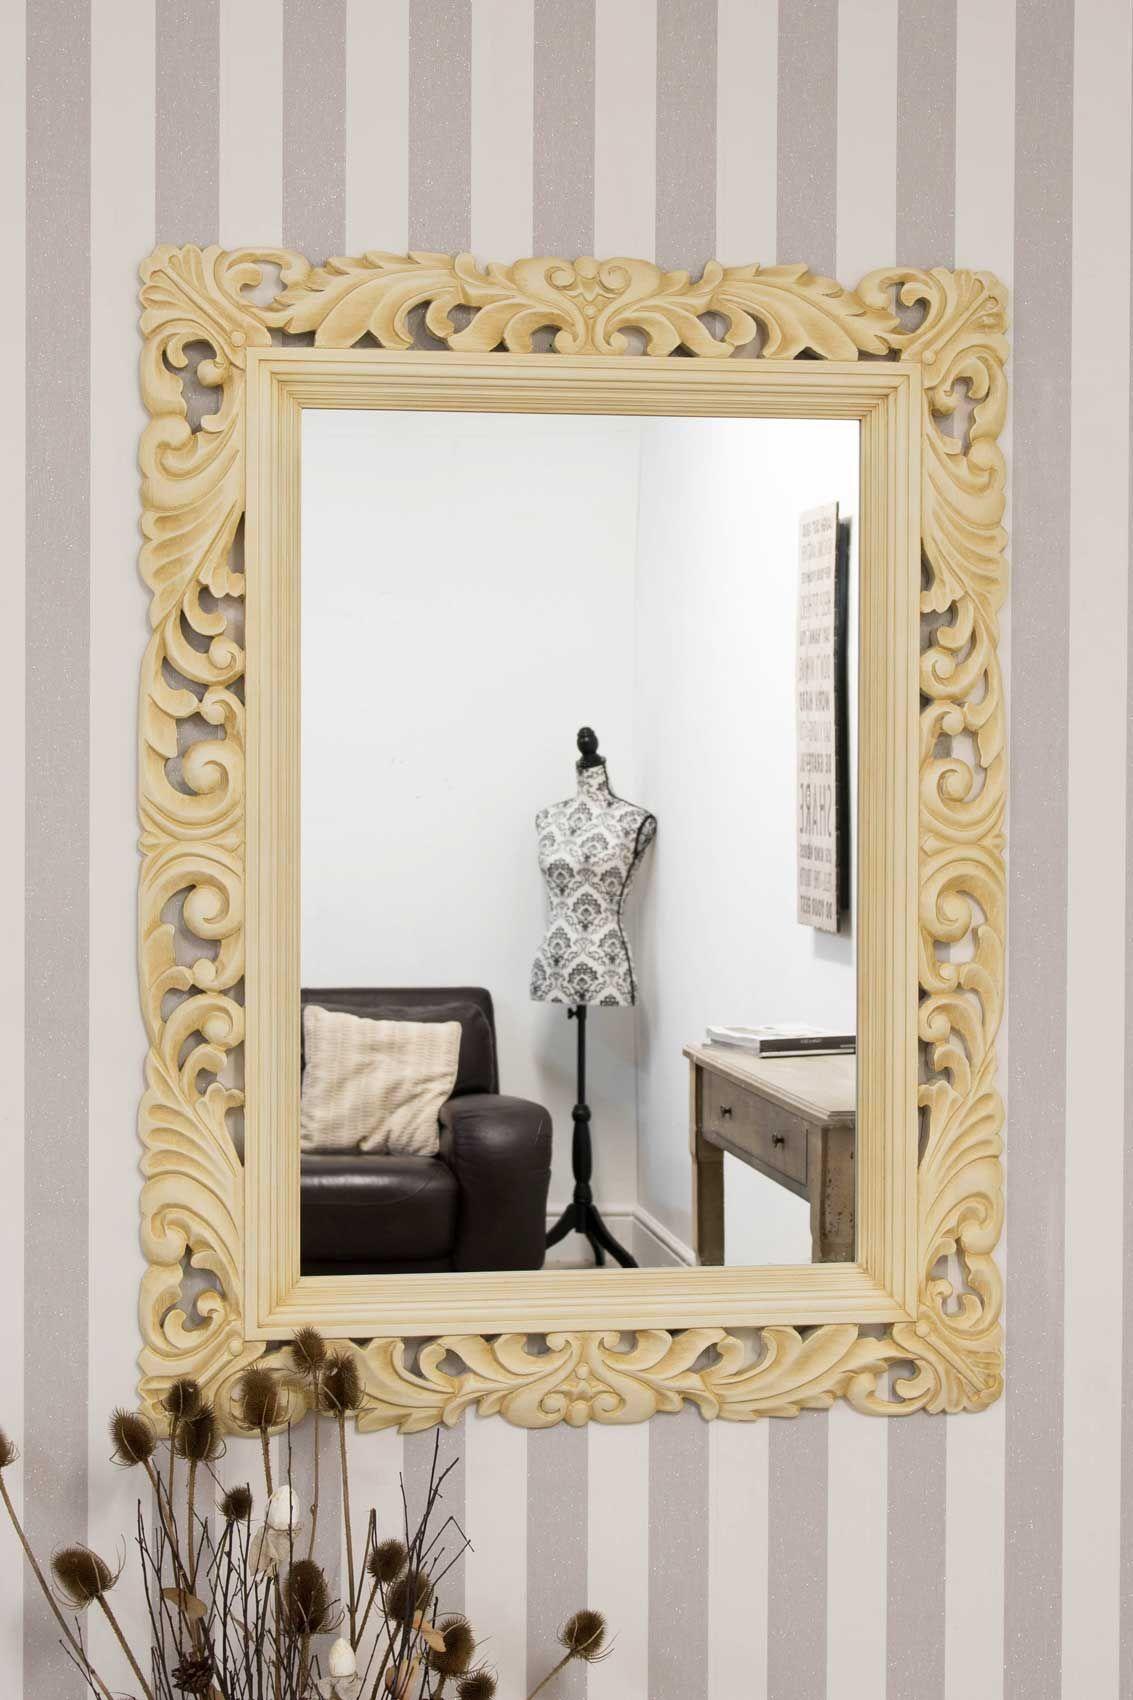 Kensington Carved Cream Wall Mirror 122 x 91cm in 2018   Mirrors ...